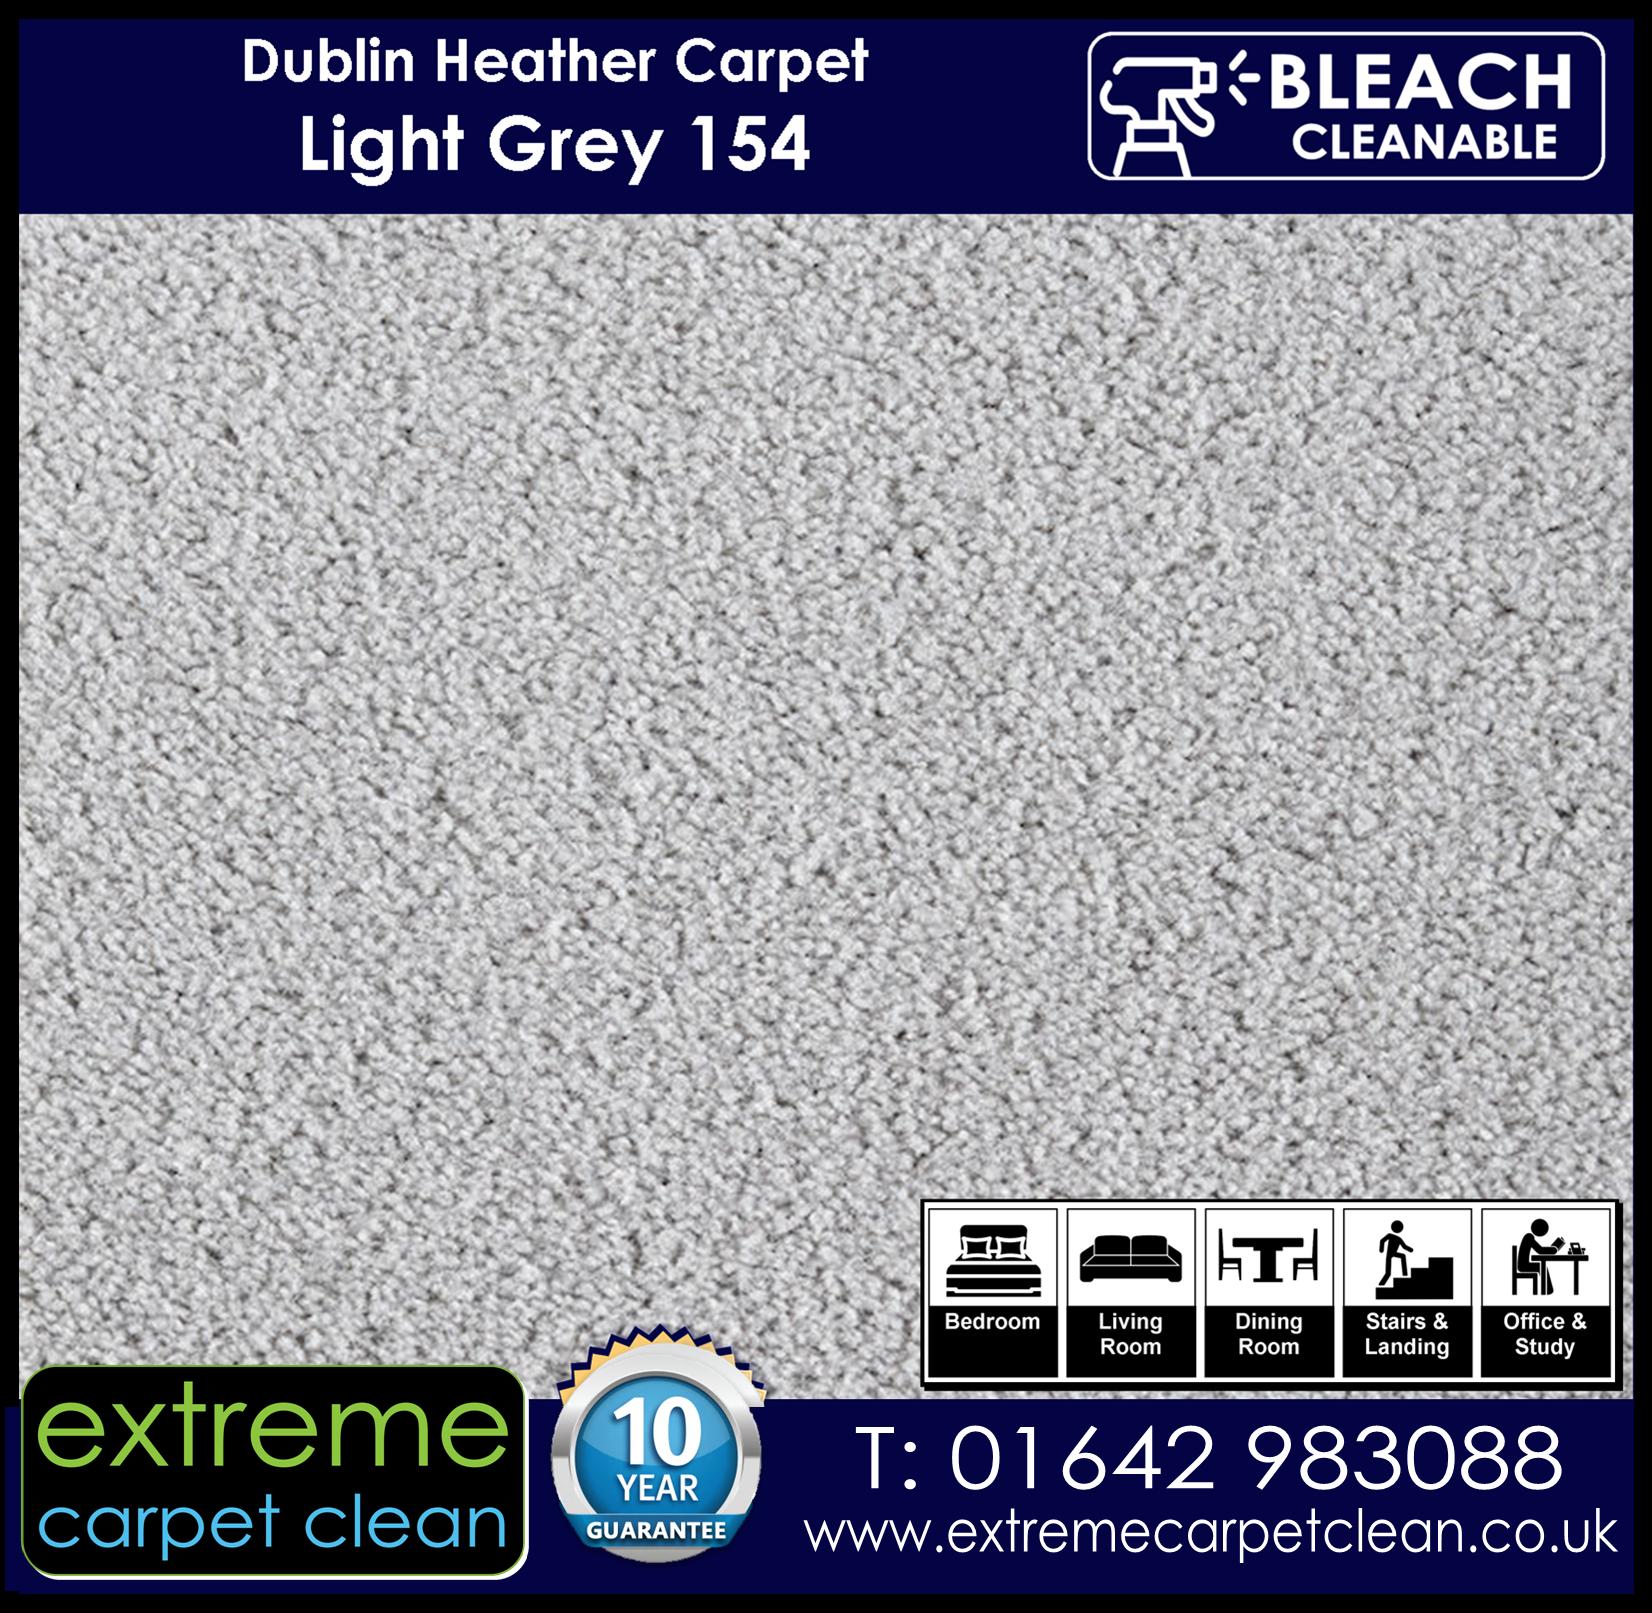 Dublin Heather Carpet Range. Light Grey 154 Extreme Carpet Clean